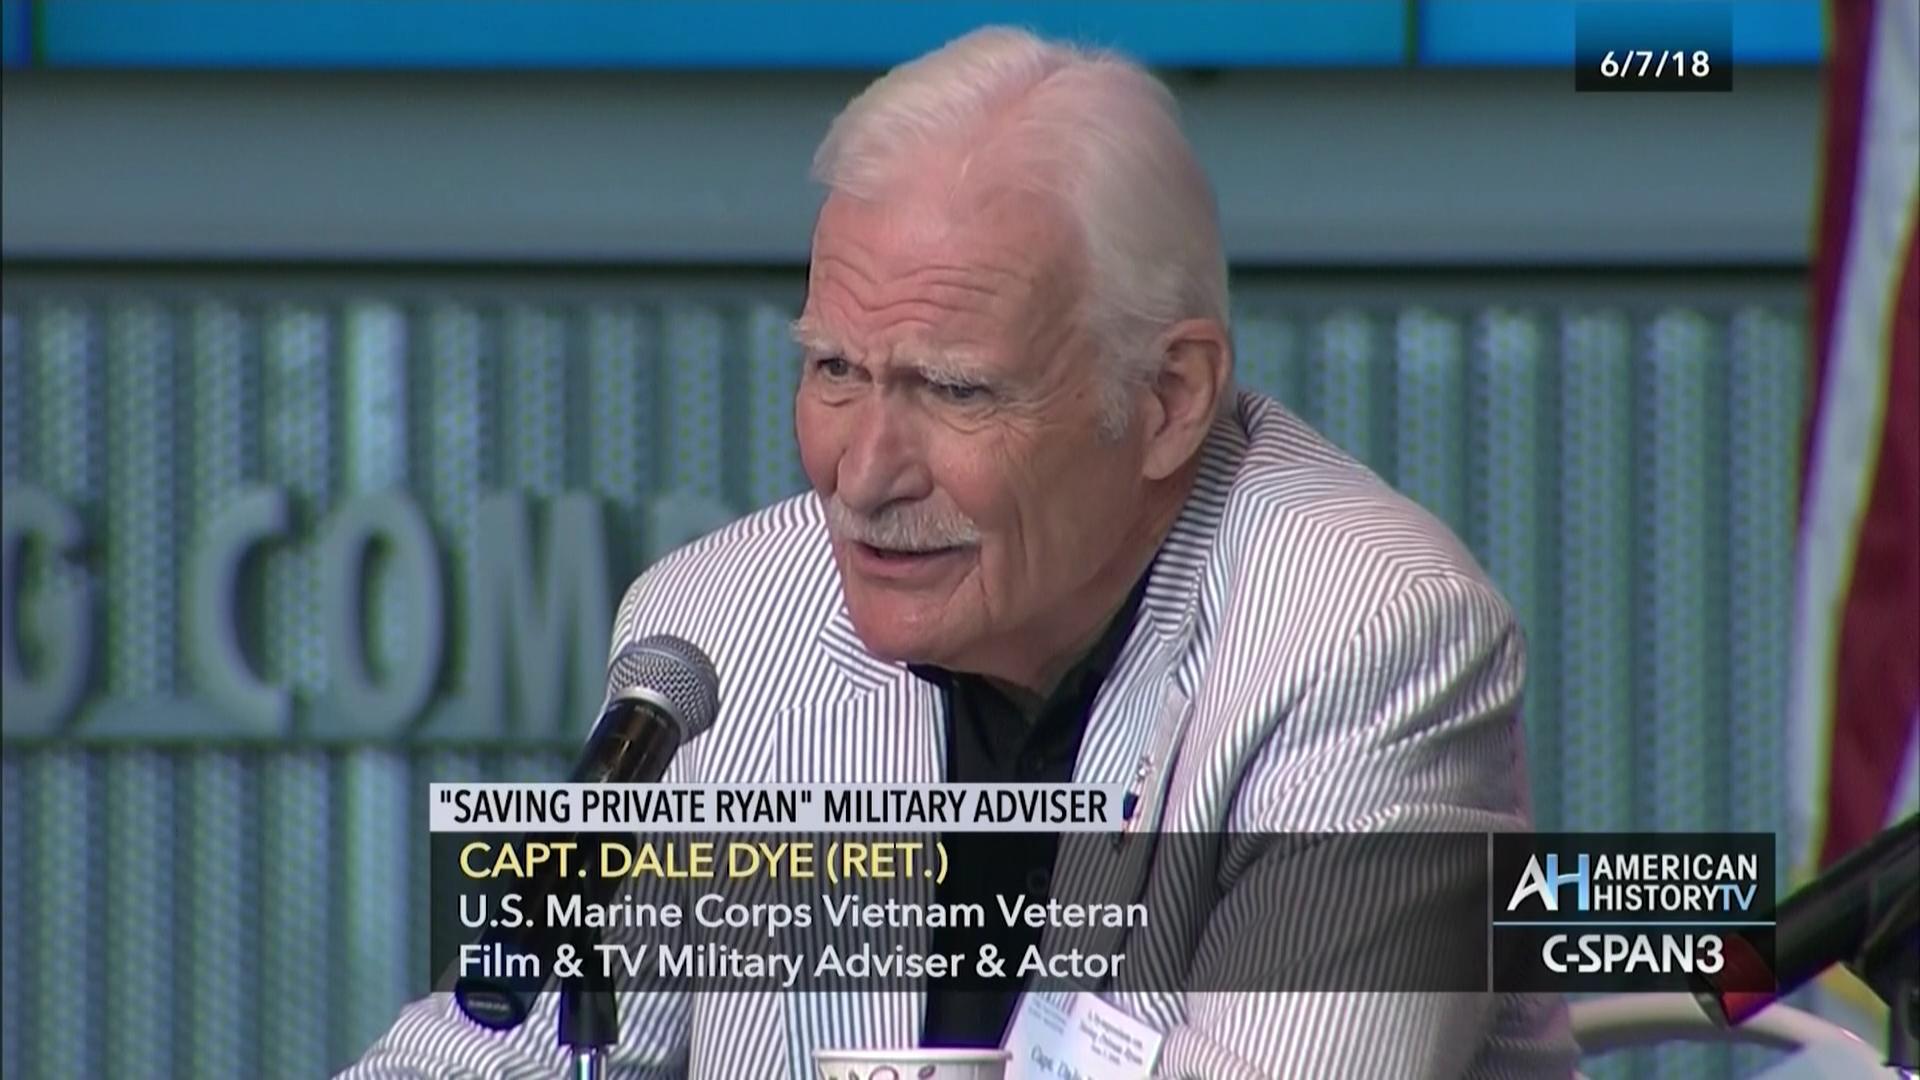 Saving Private Ryan Military Adviser C Span Org